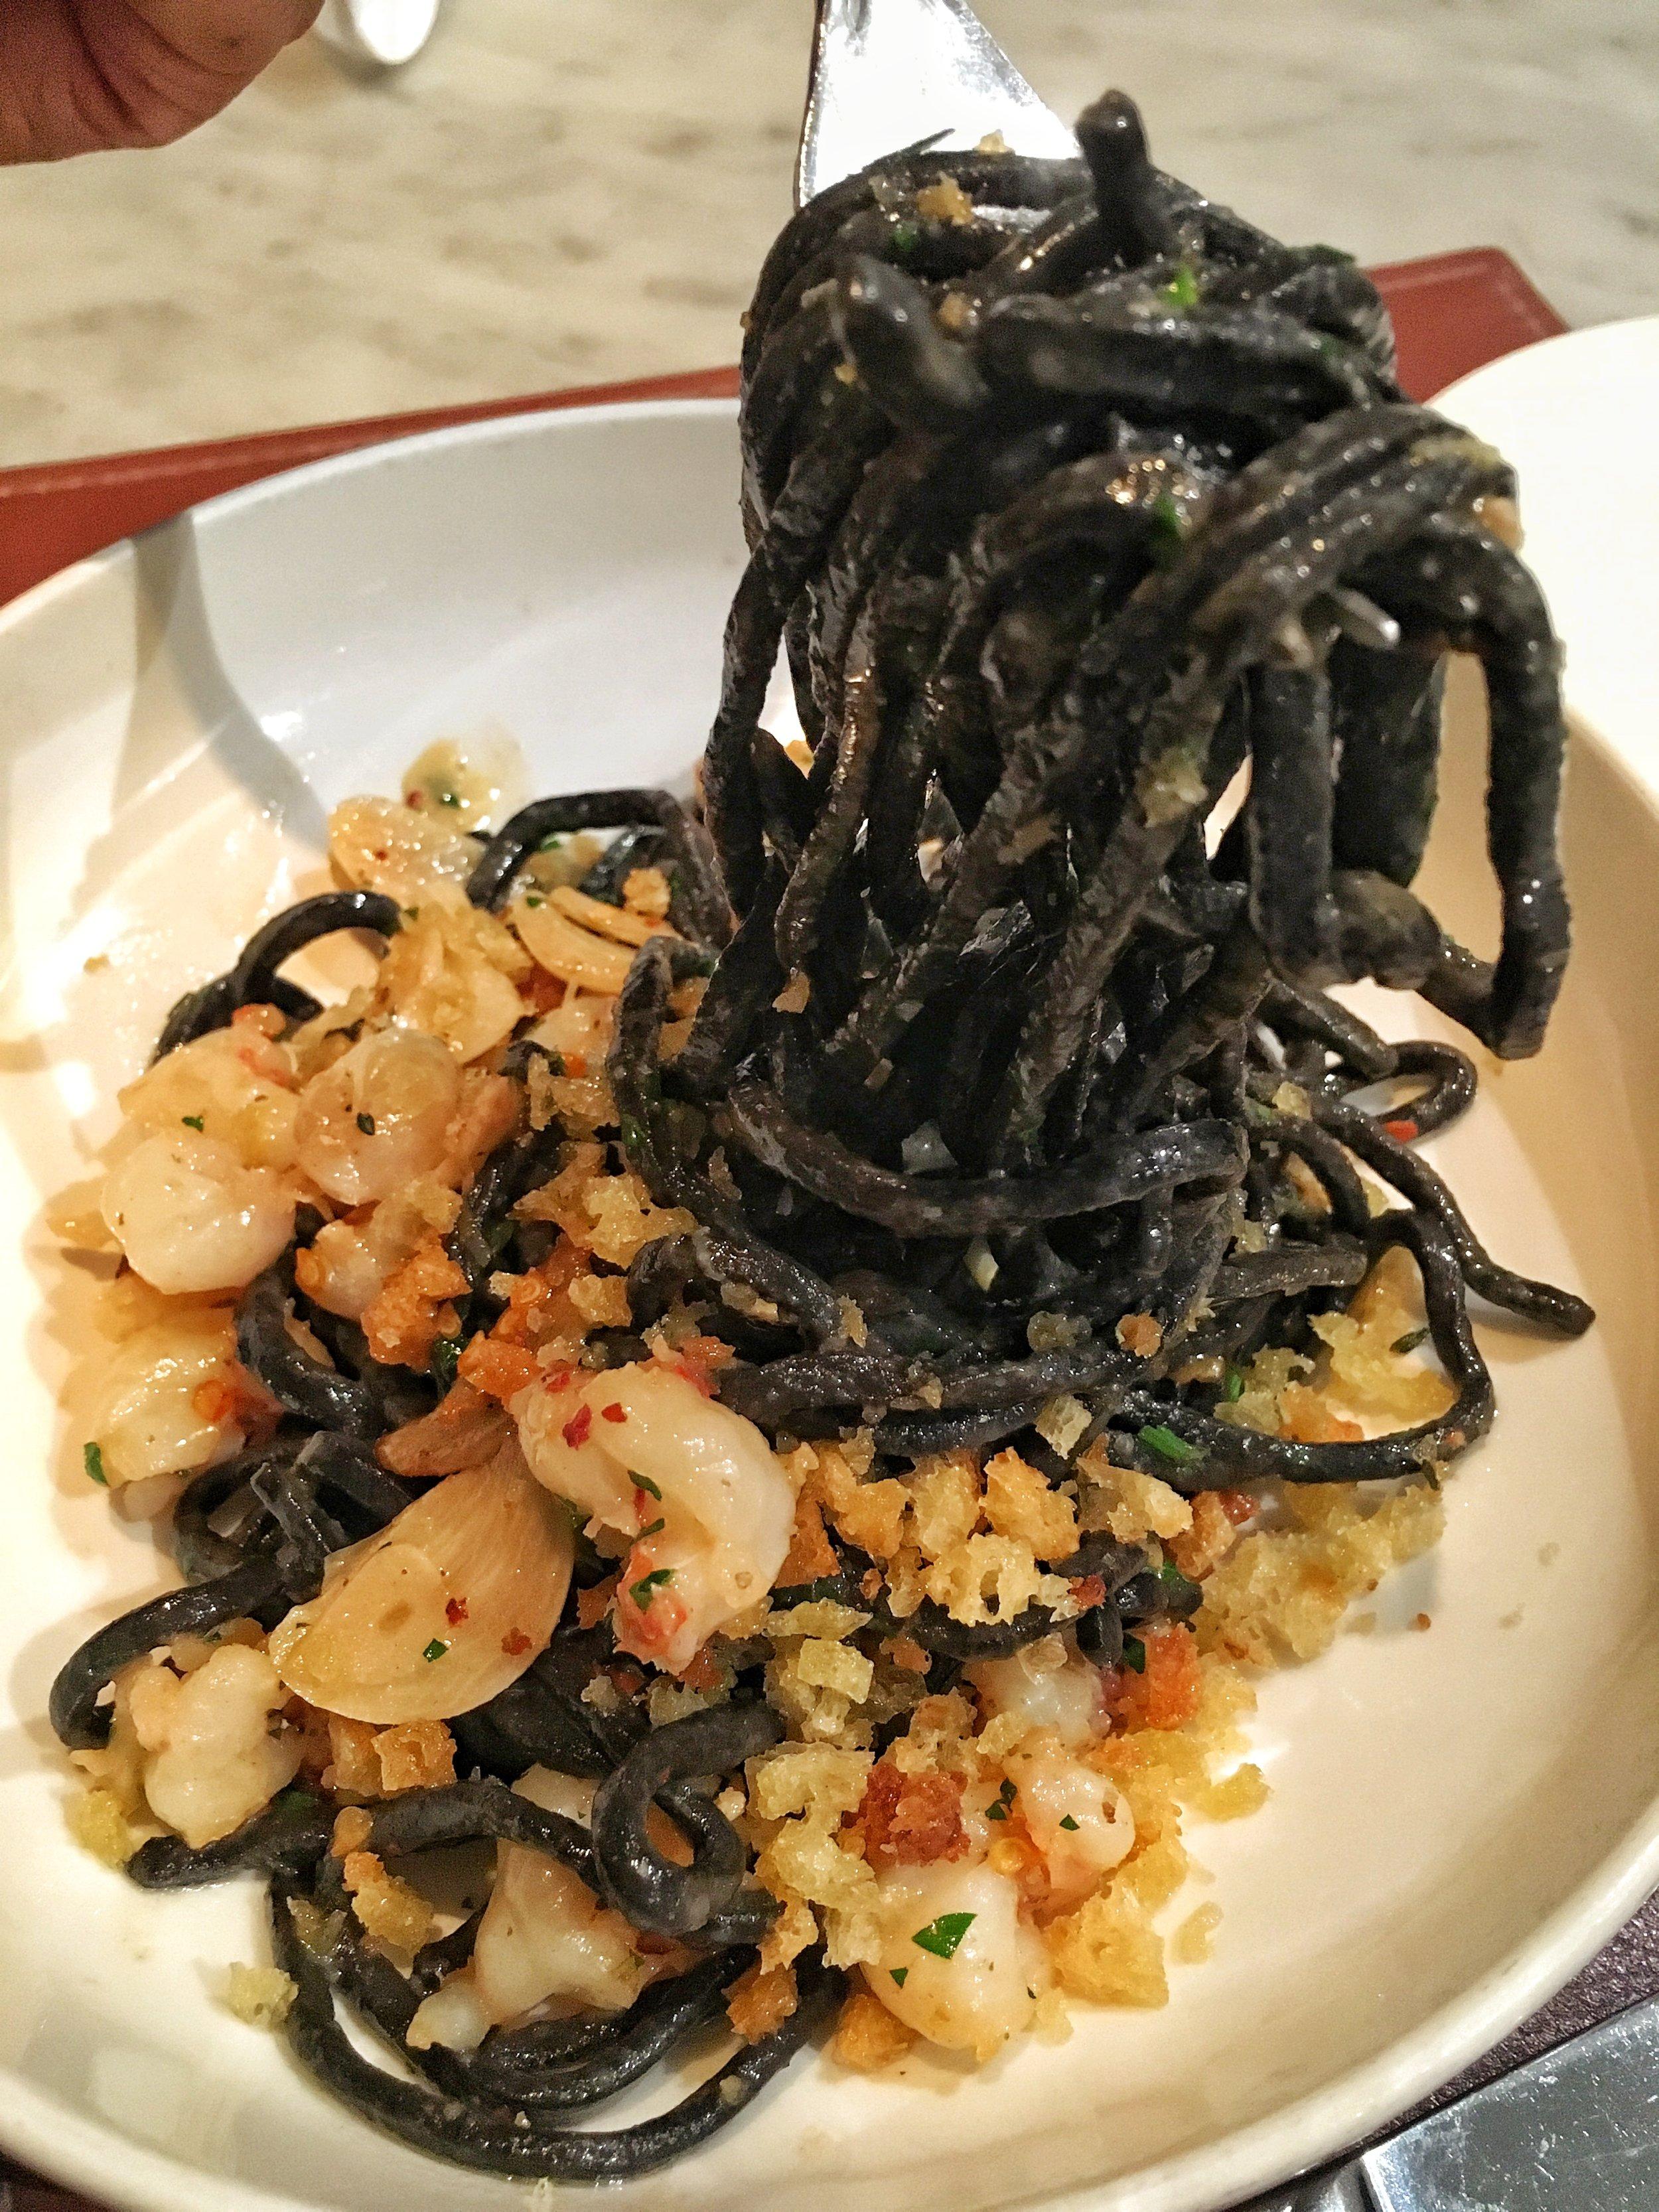 Linguine nero, rock shrimp, chilies, breadcrumbs